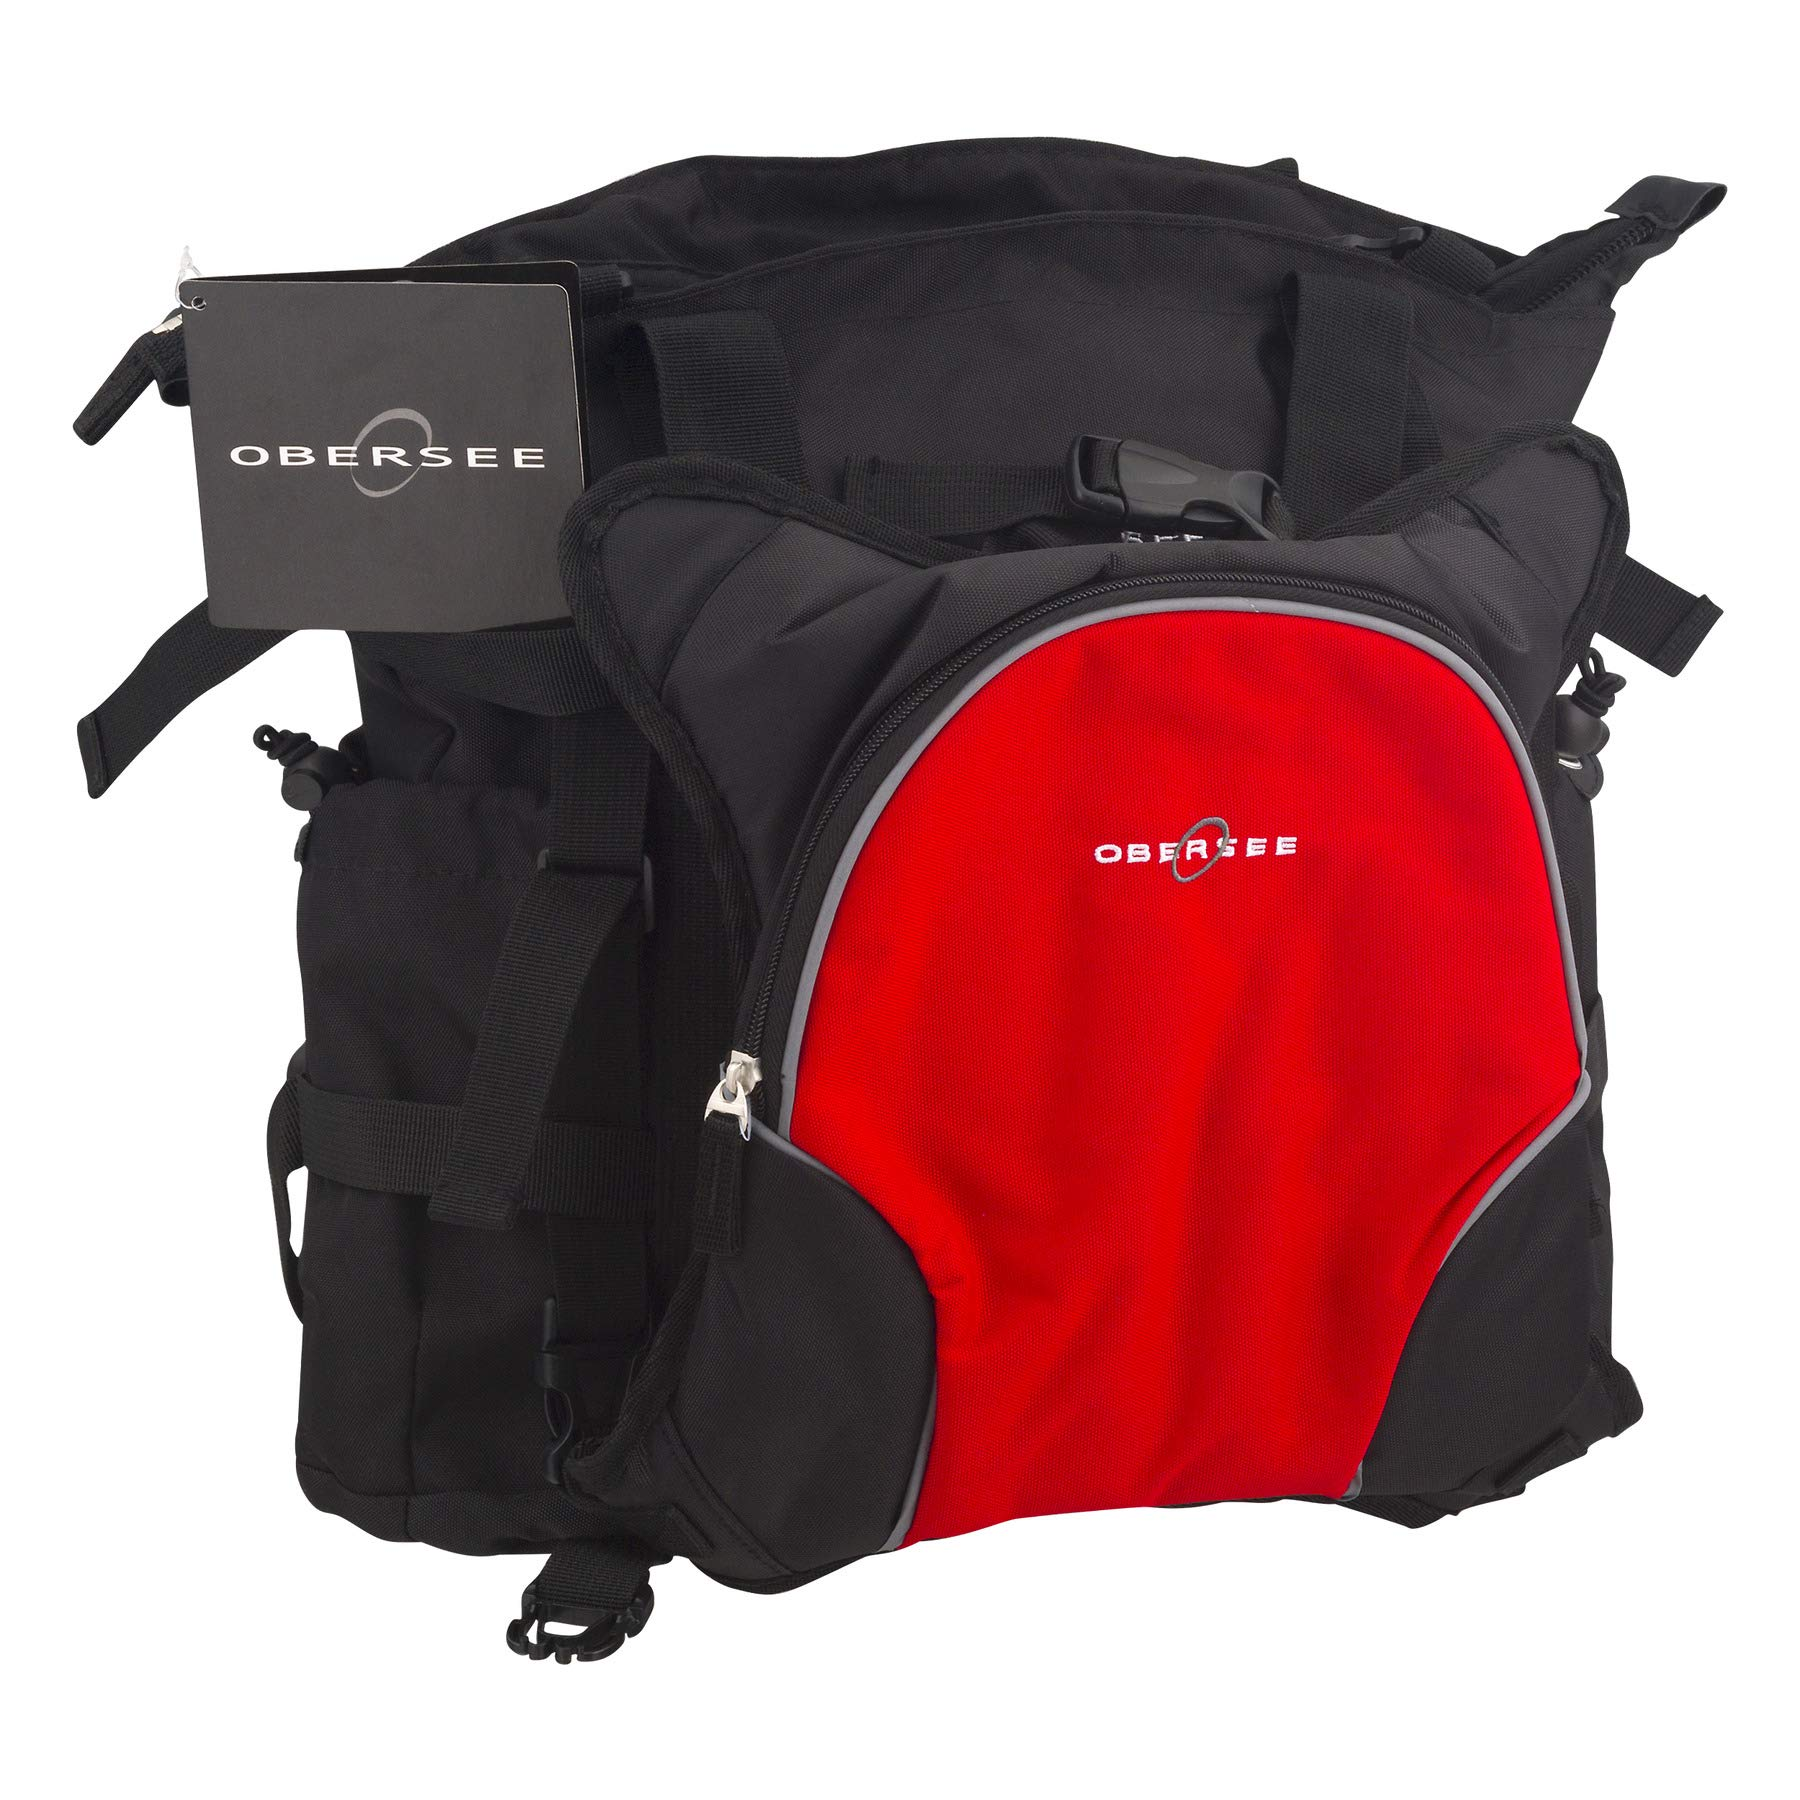 Obersee Innsbruck Diaper Bag Tote with Cooler, Black/Cloud